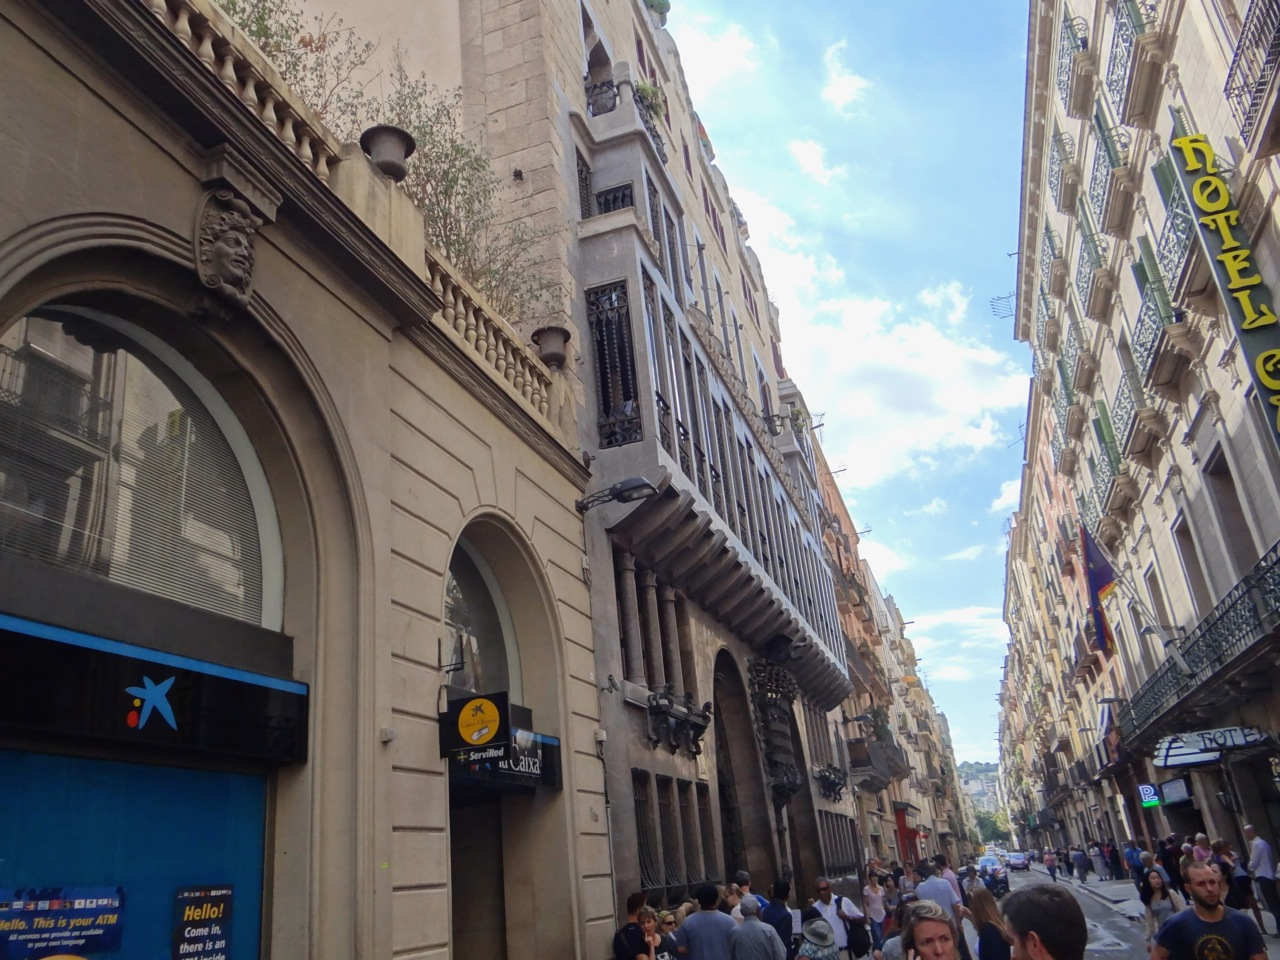 Barselona street